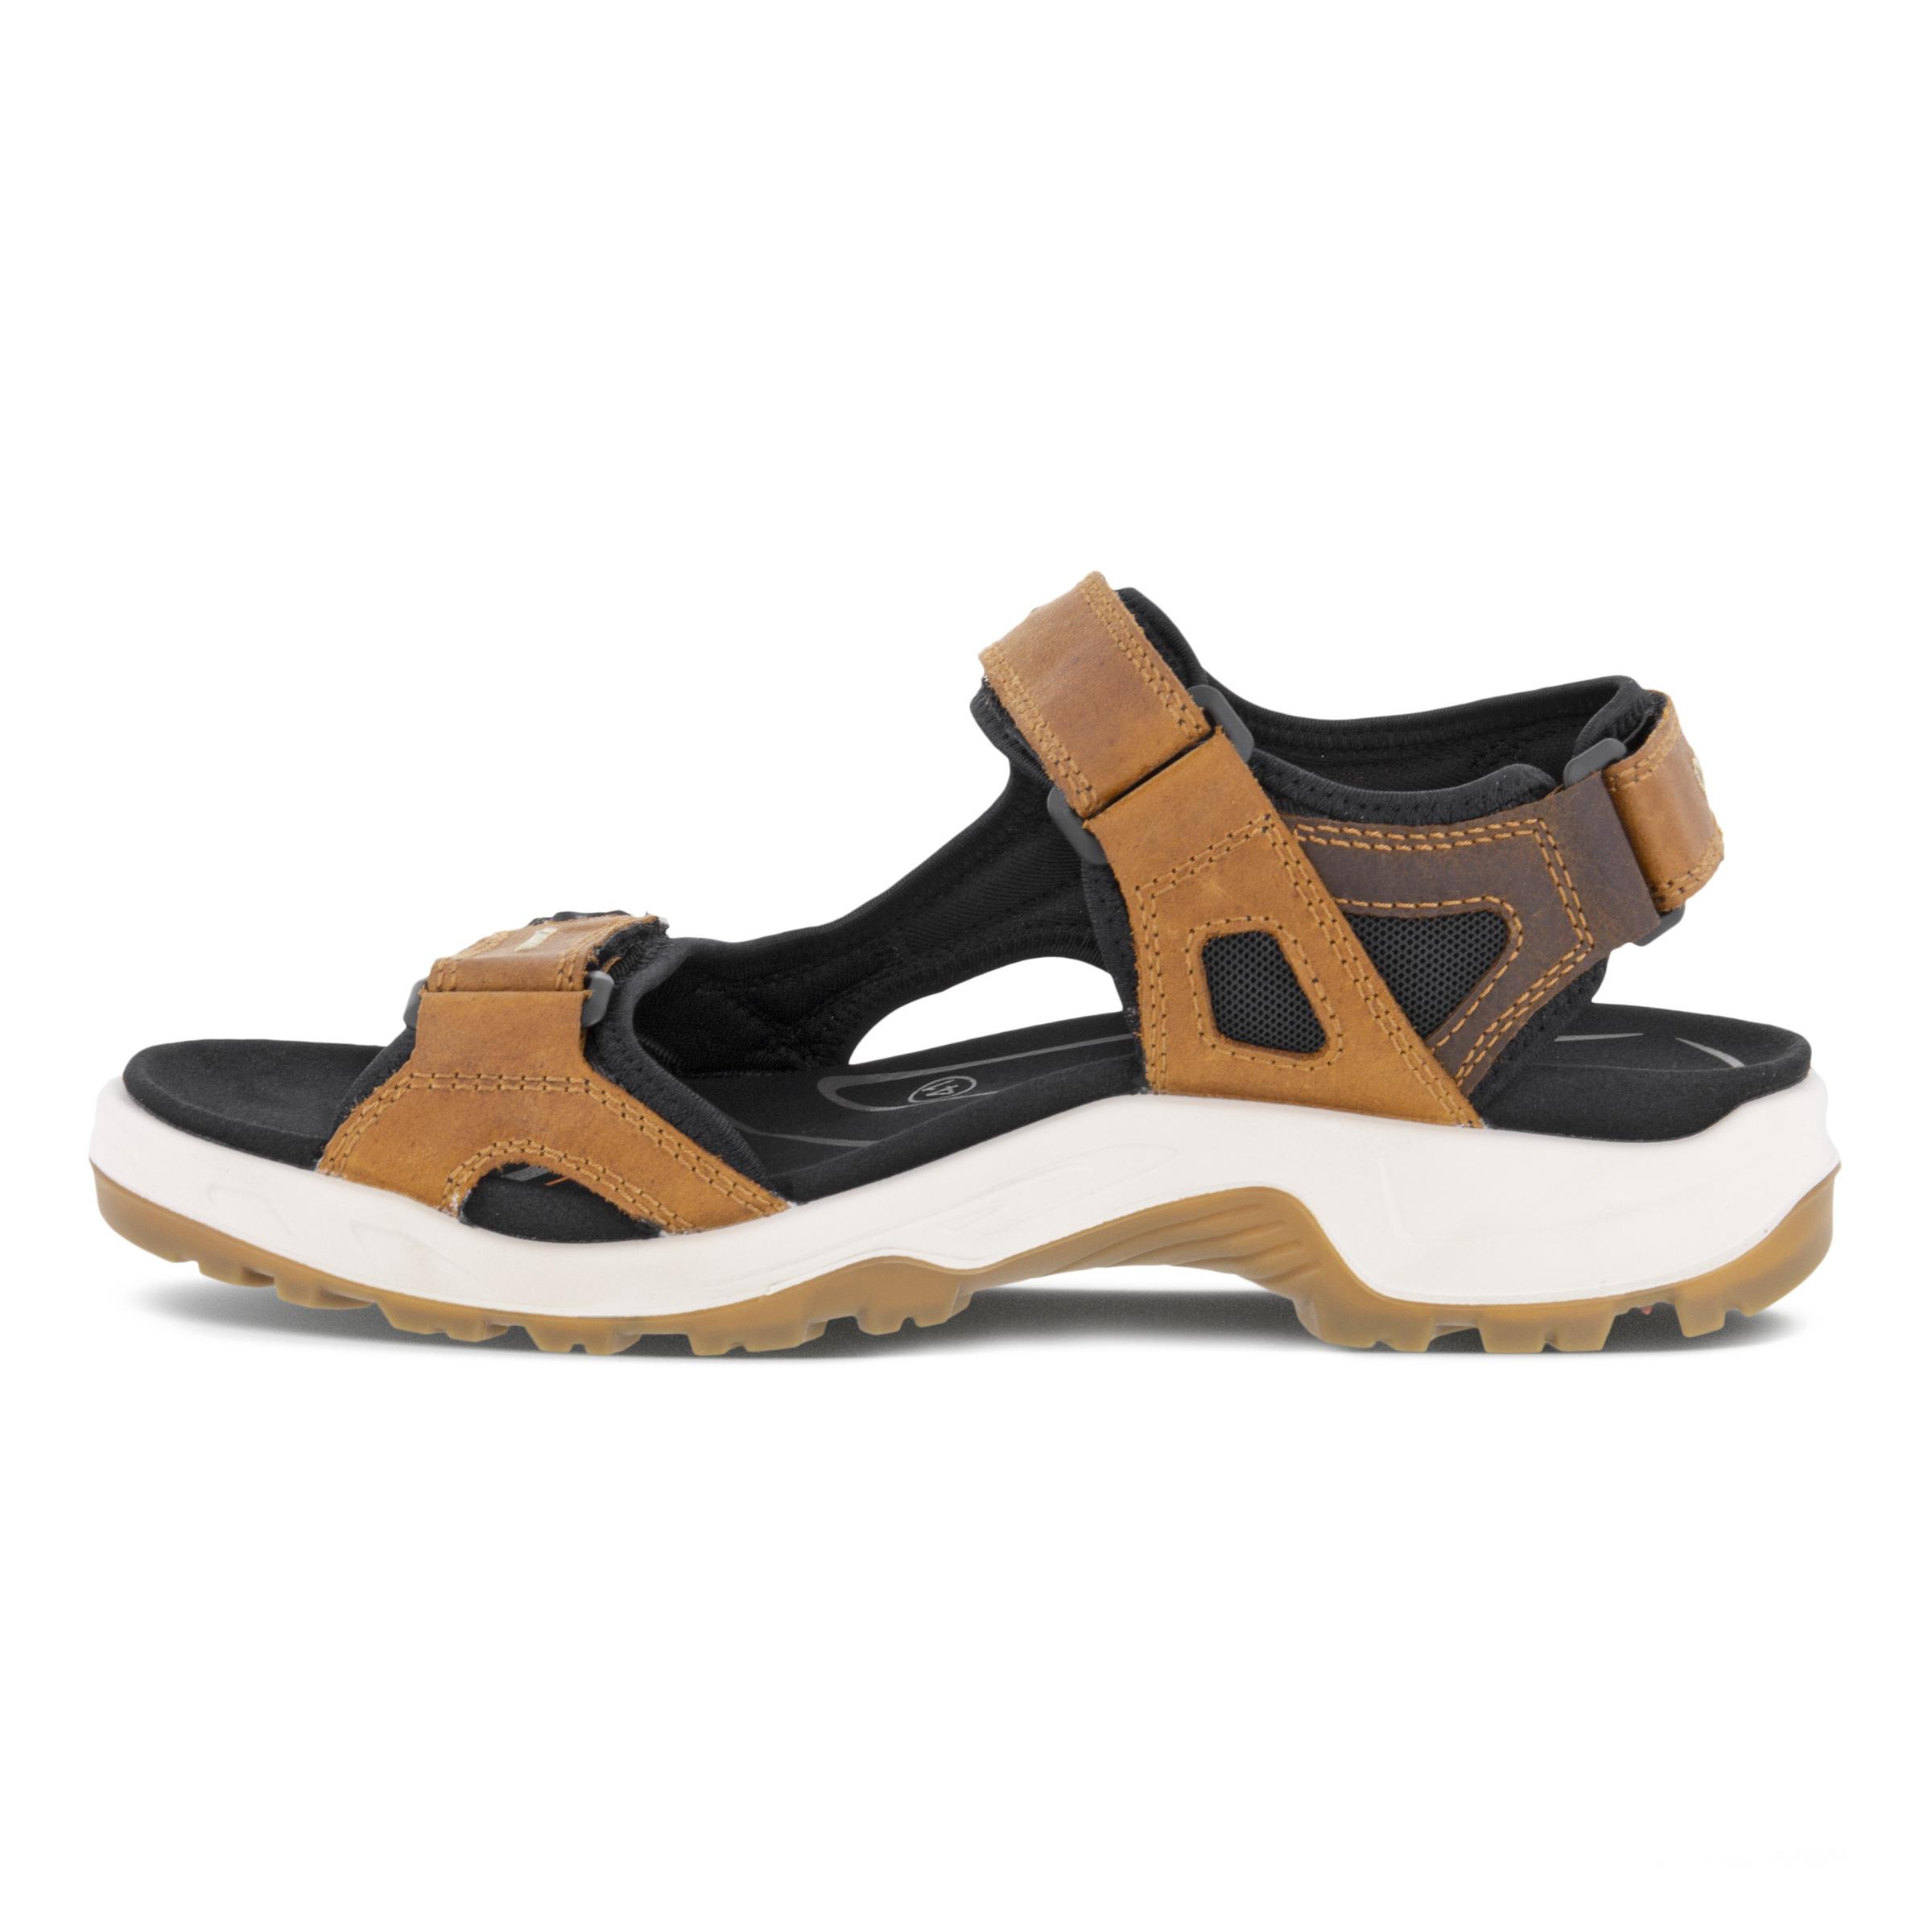 Ecco Offroad herre sandal, orange, 46